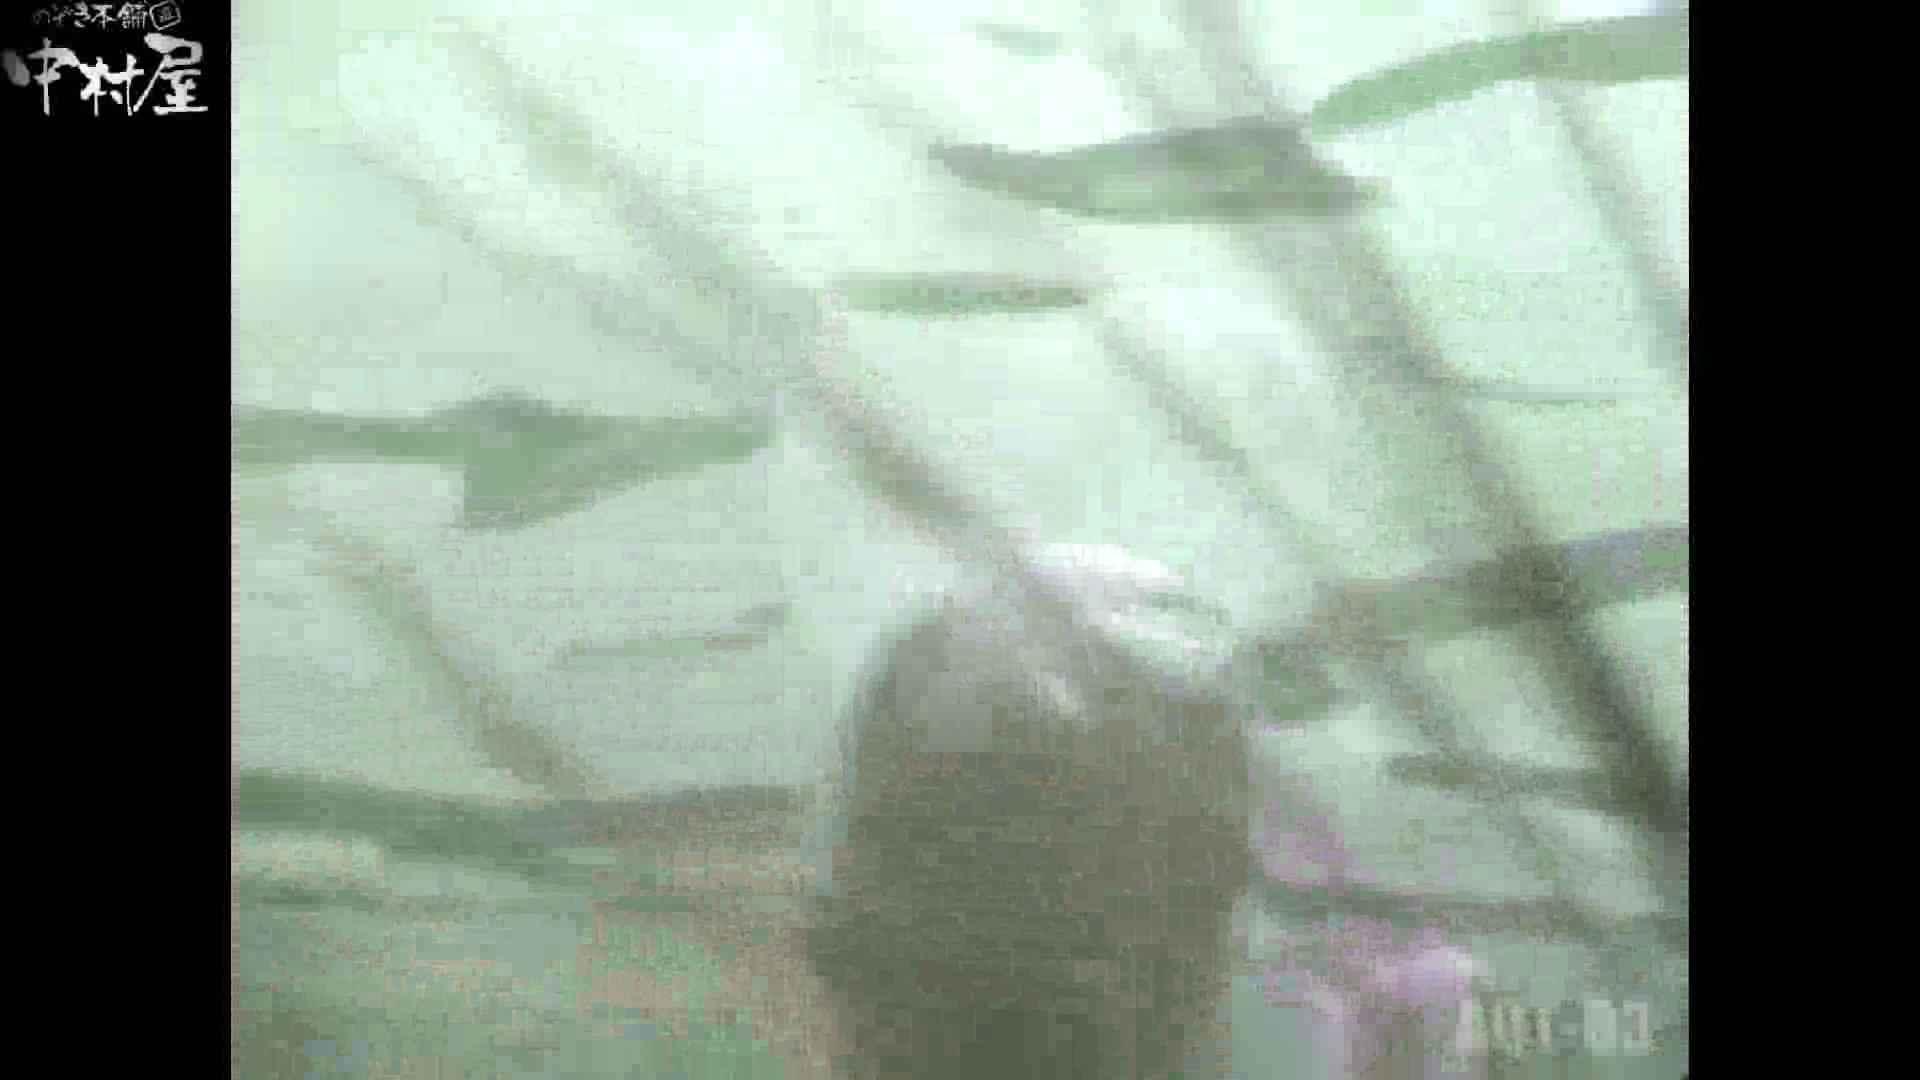 Aquaな露天風呂Vol.867潜入盗撮露天風呂参判湯 其の二 潜入突撃 セックス無修正動画無料 93pic 54